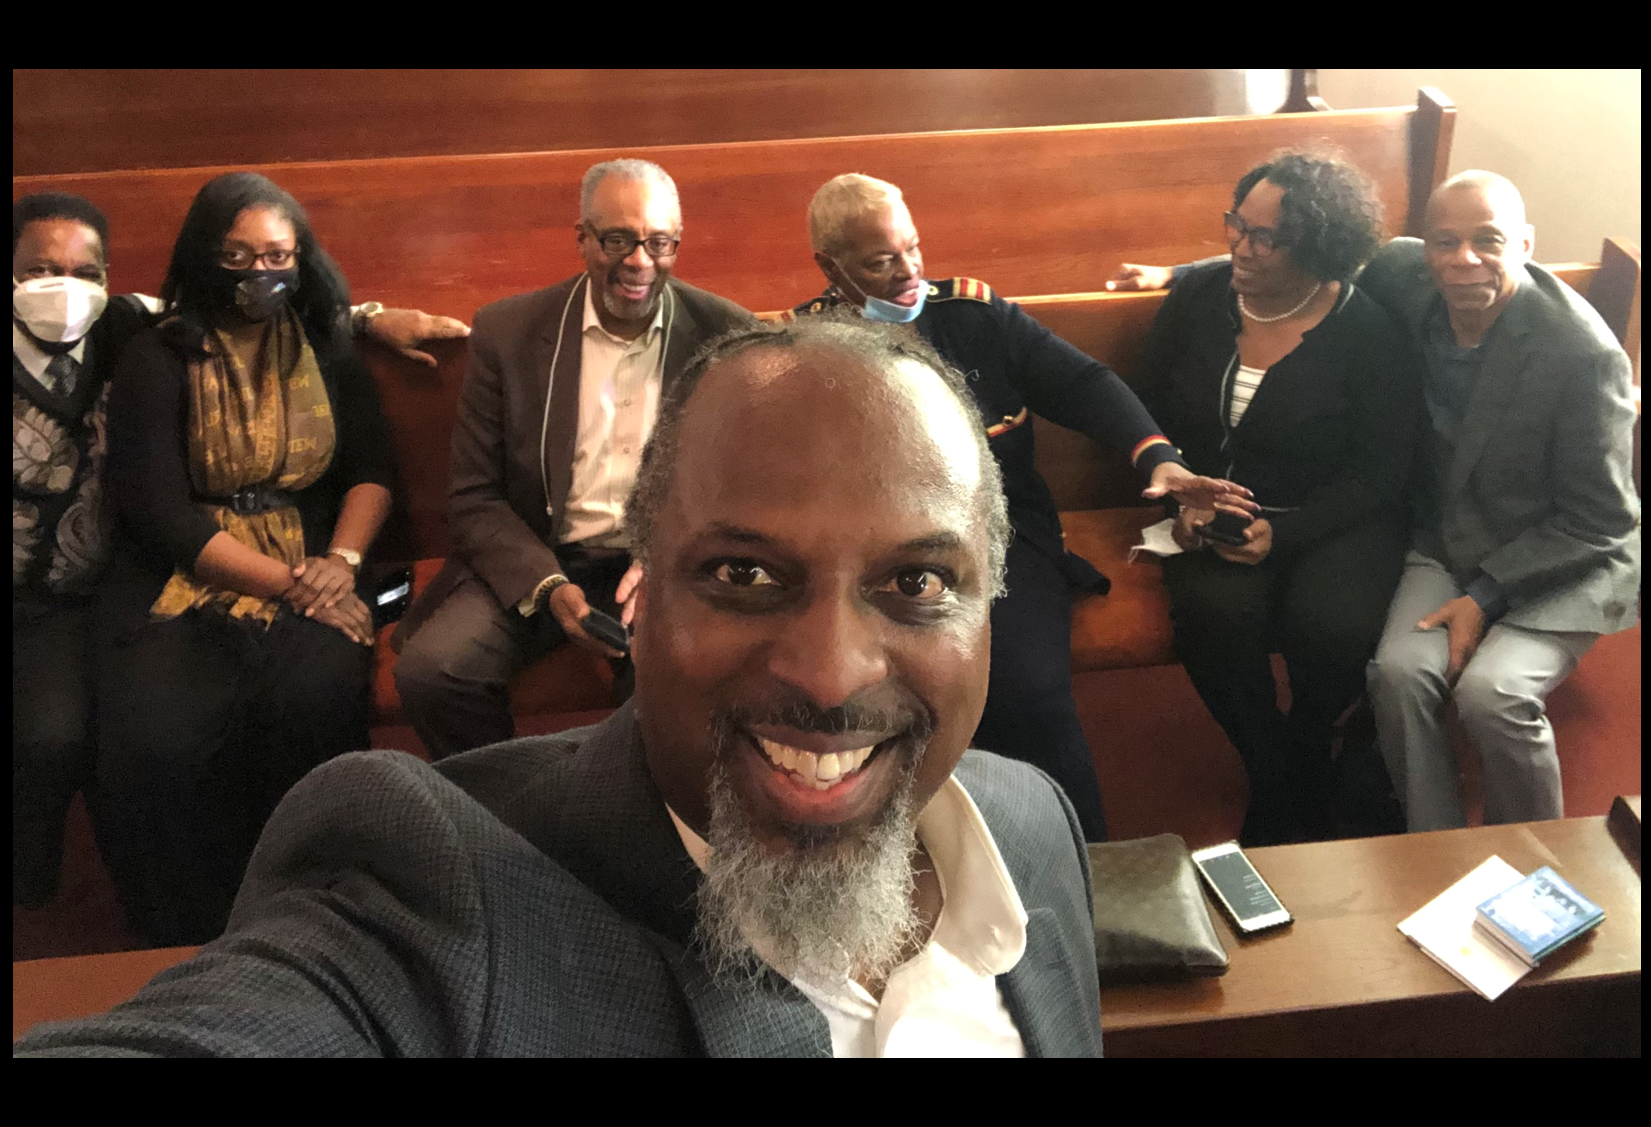 November 17 - Pastors' Meeting